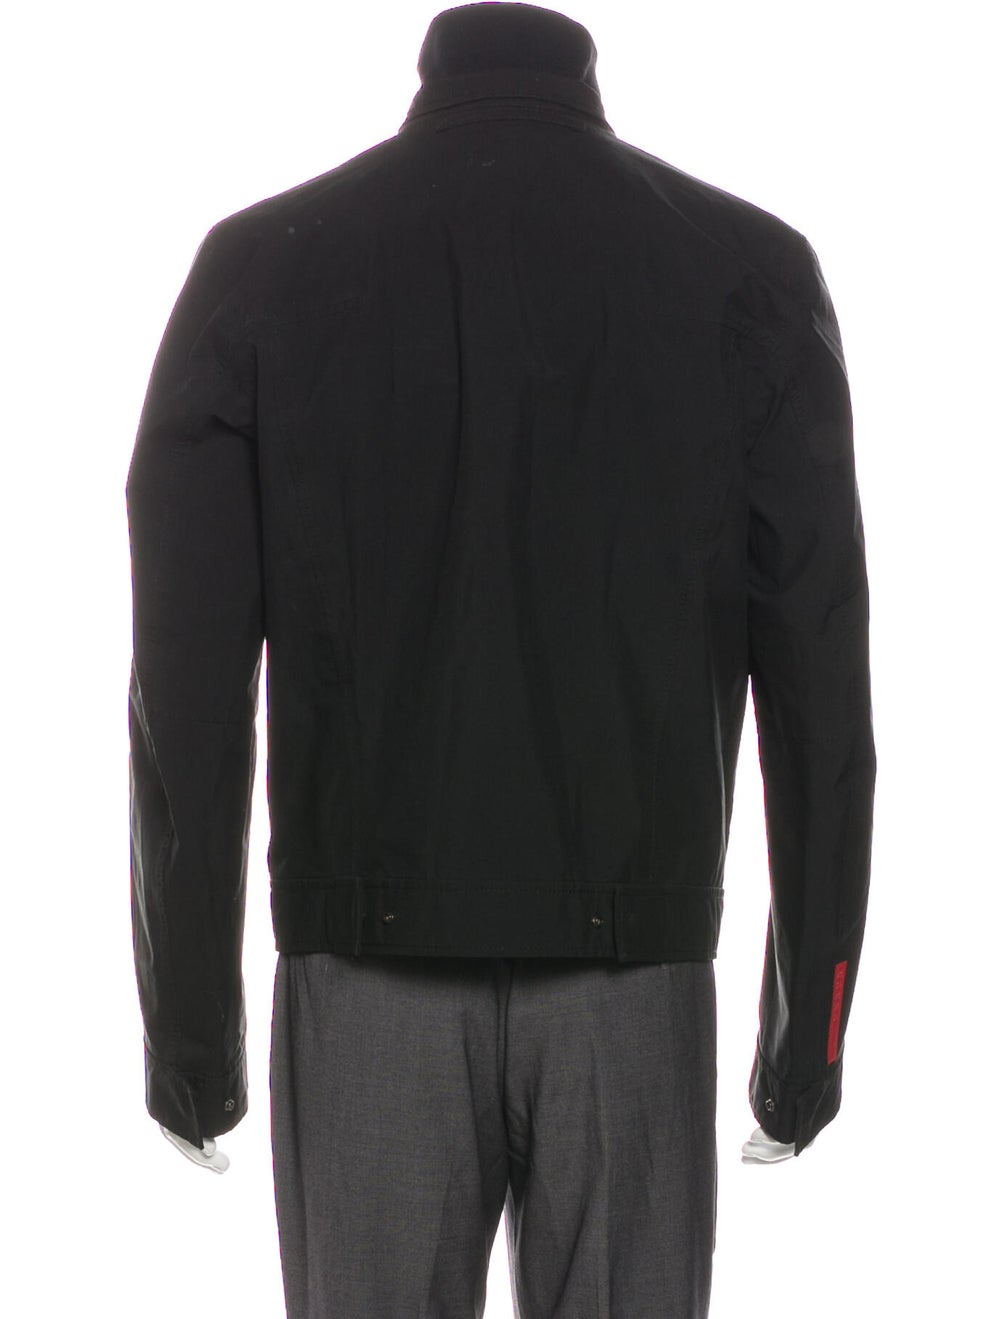 Prada Sport Trucker Jacket Black - image 3